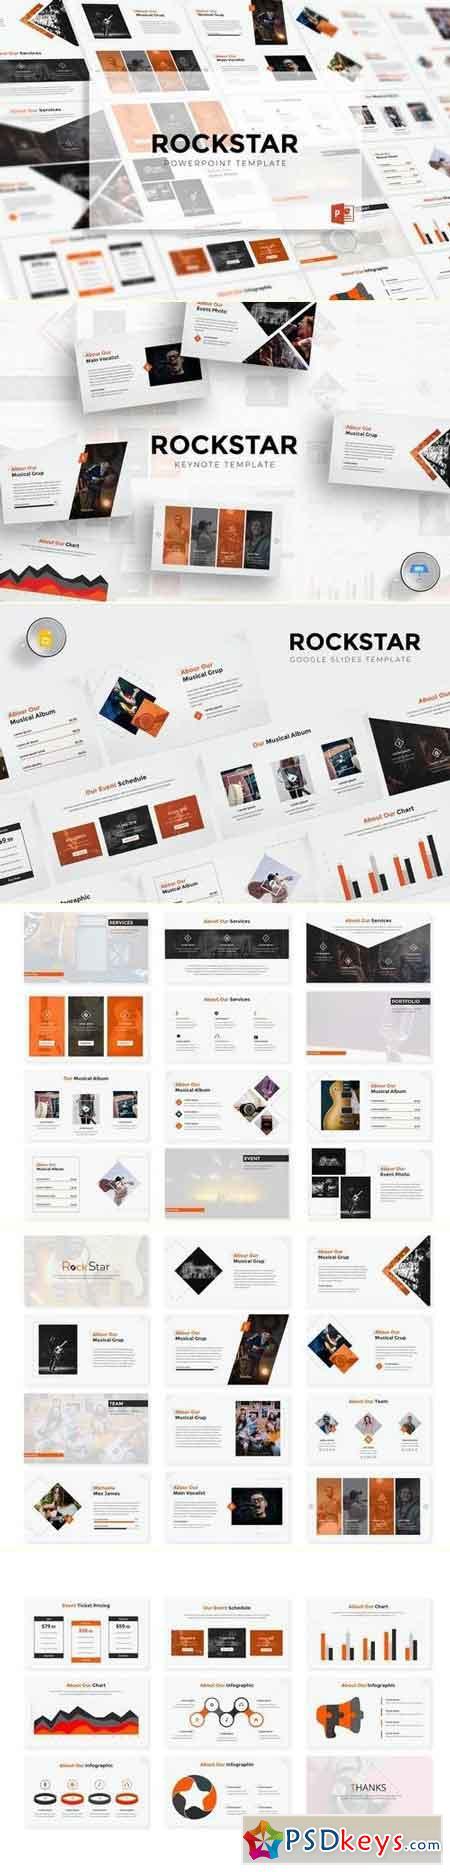 Rockstar Powerpoint & Keynote & Google Slide Template